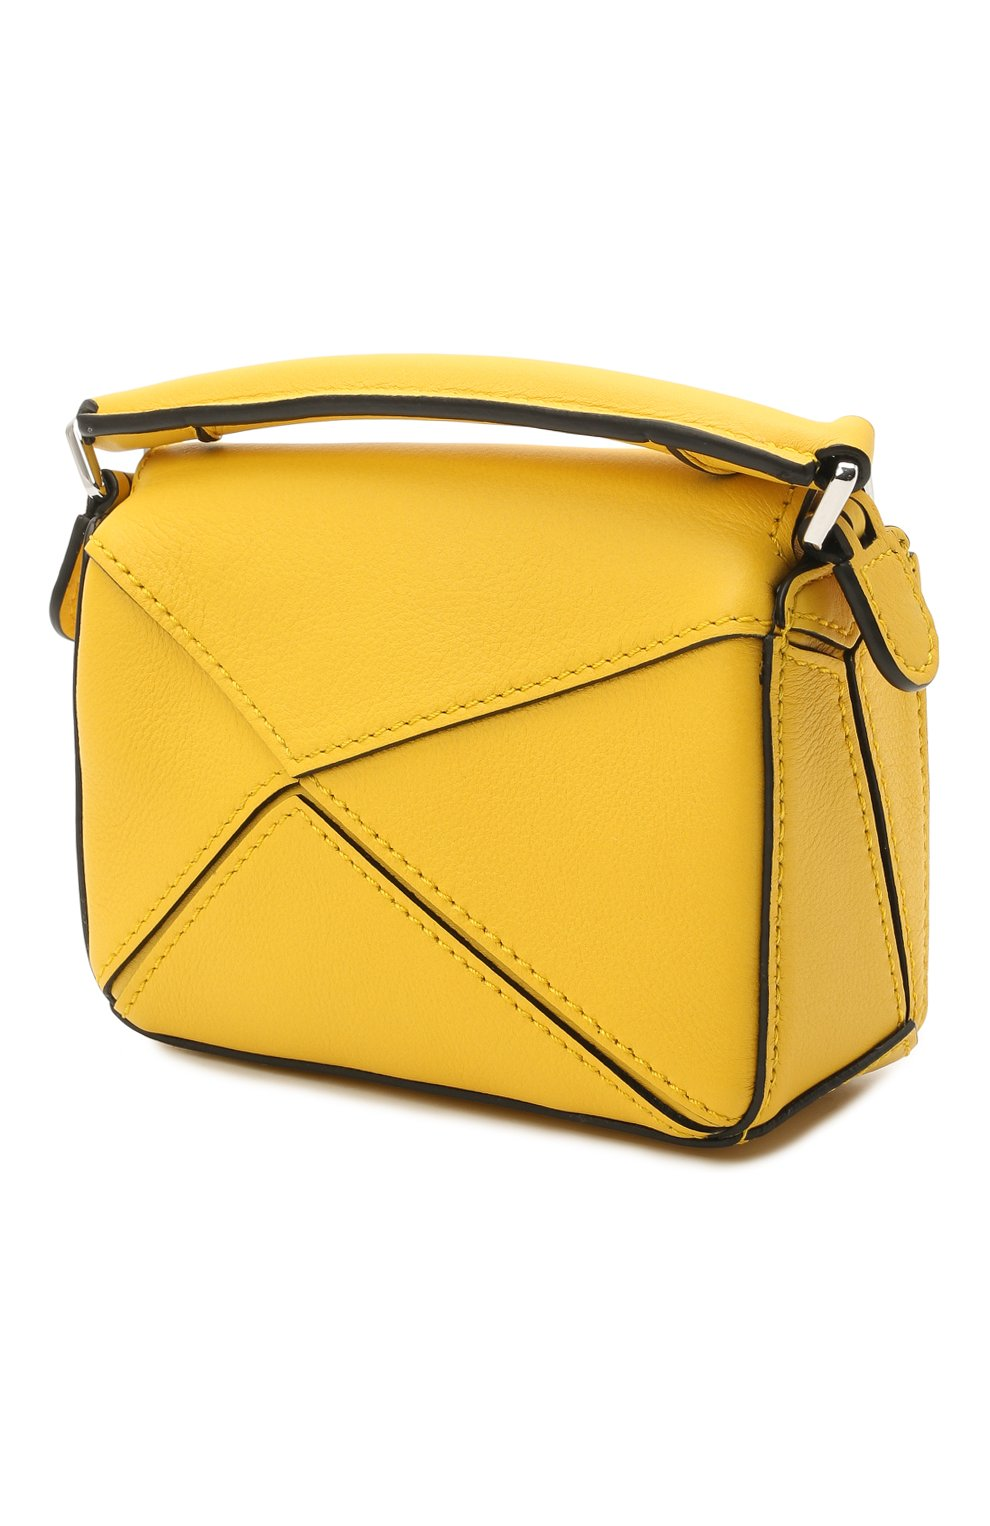 Женская сумка puzzle nano LOEWE желтого цвета, арт. A510U98X01 | Фото 3 (Ремень/цепочка: С цепочкой, На ремешке; Сумки-технические: Сумки top-handle; Материал: Натуральная кожа; Размер: mini)